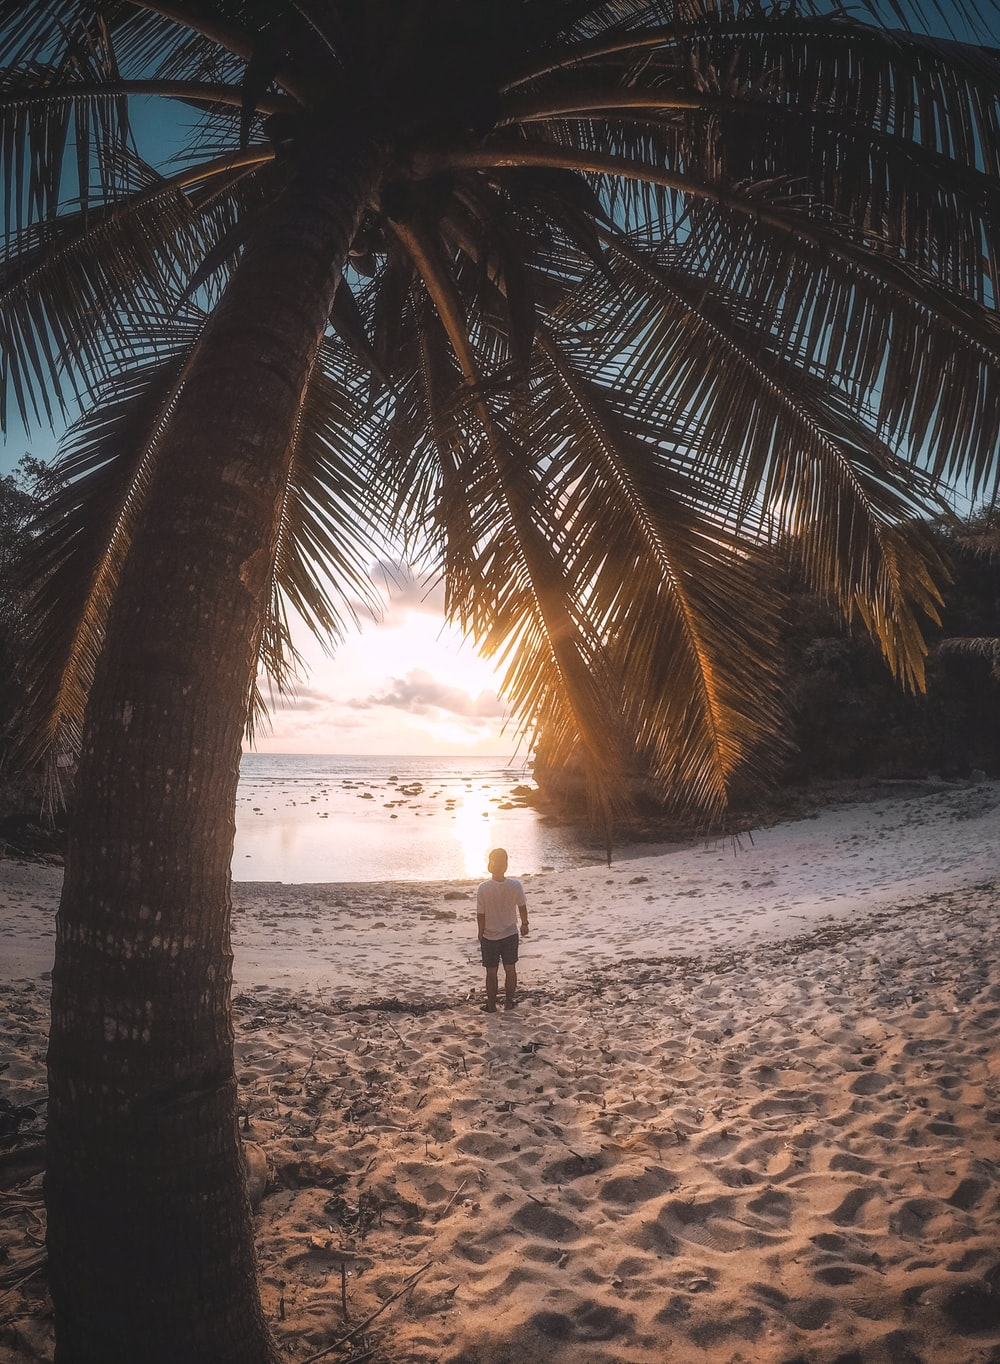 man standing on beach near palm treses